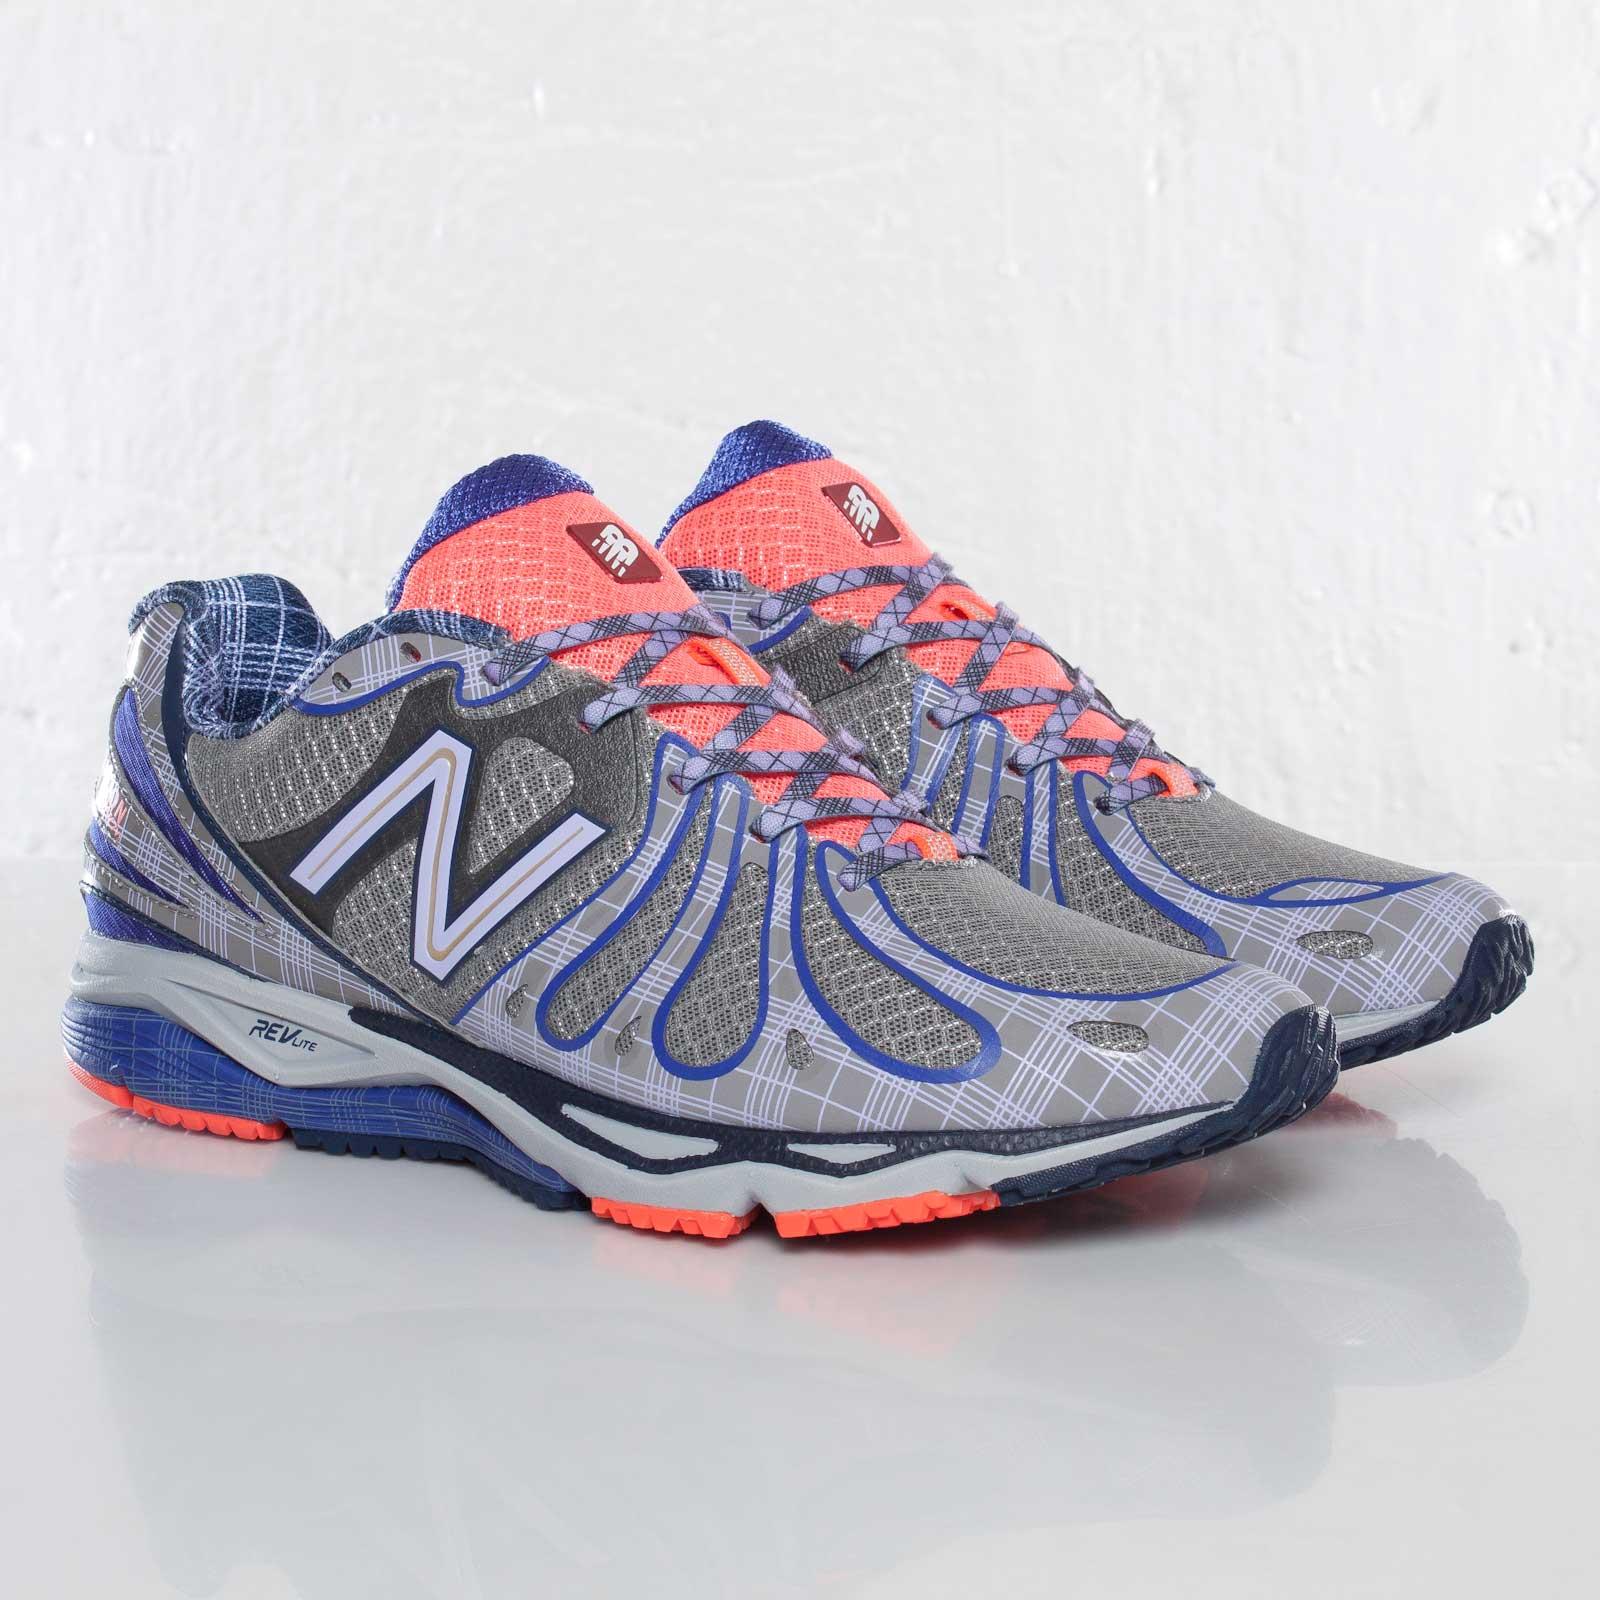 New Balance M890 - M890lon3 - SNS   sneakers & streetwear online ...